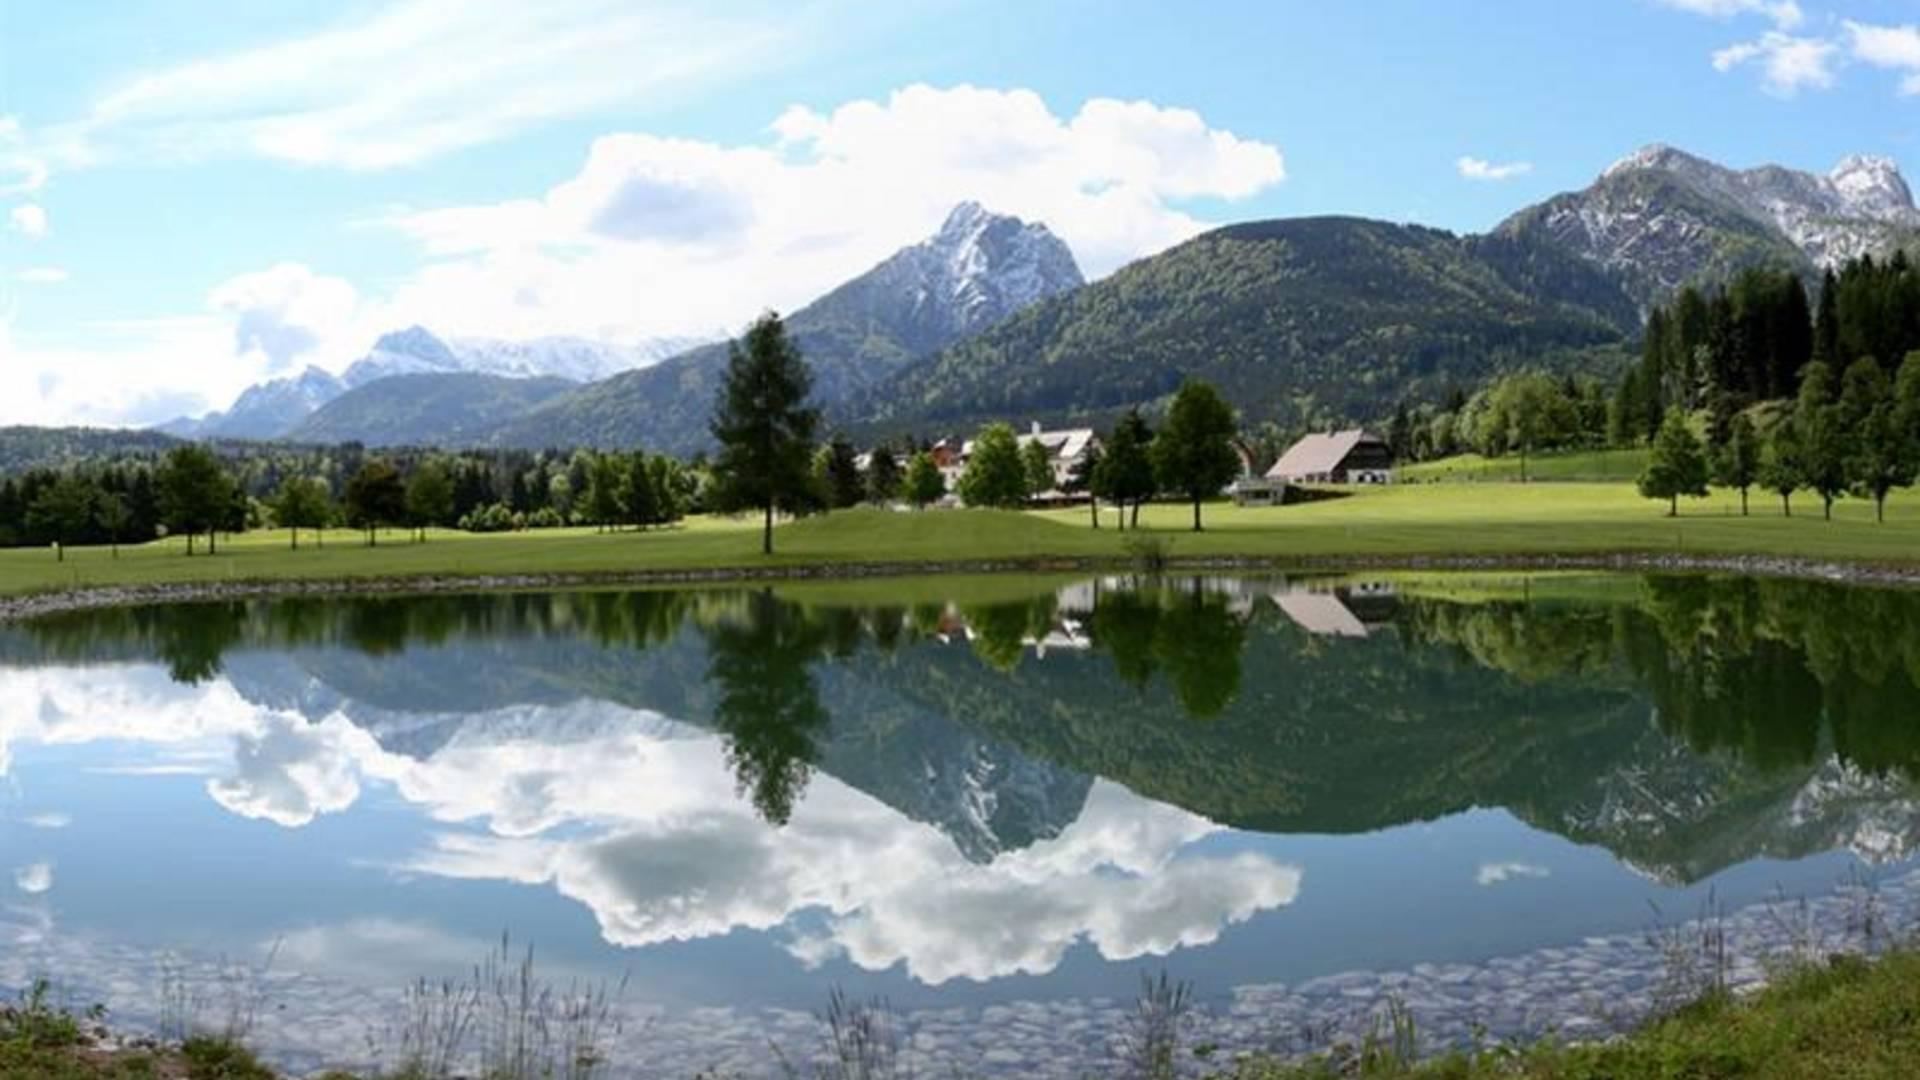 Golf-Senza-Confini-Tarvisio-14189_SCALED_800x800.jpg